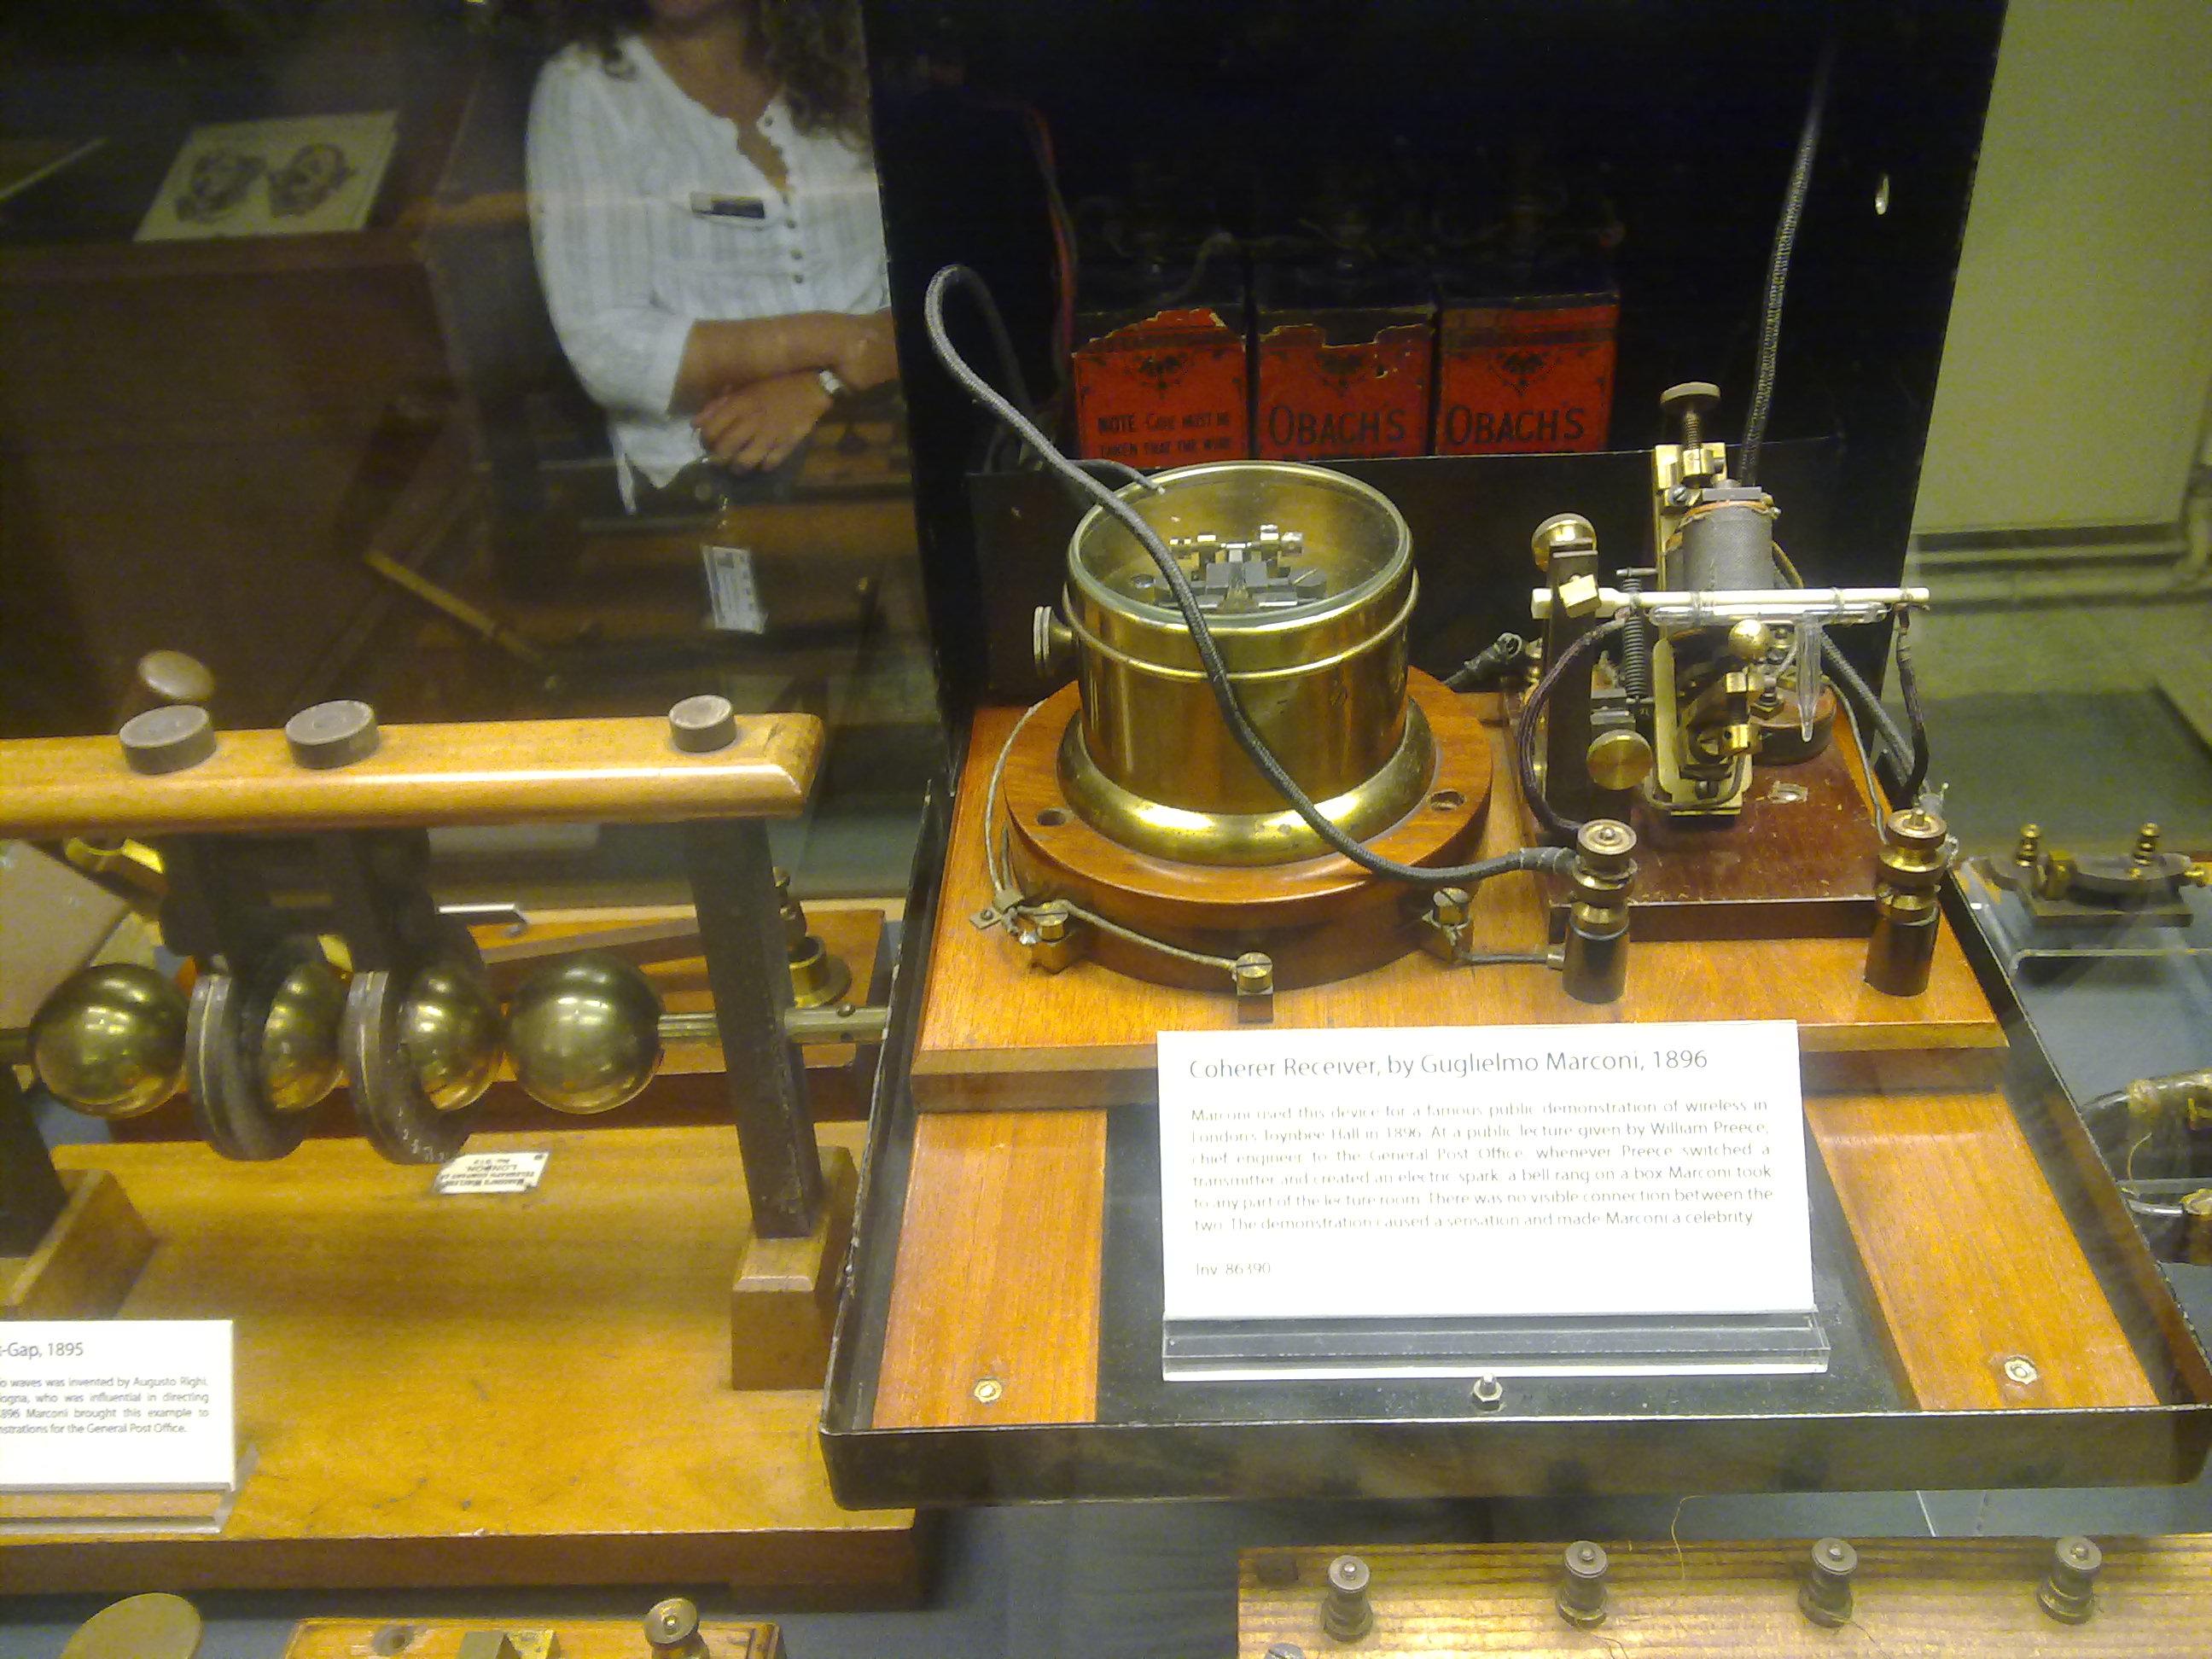 Marconi's receiver